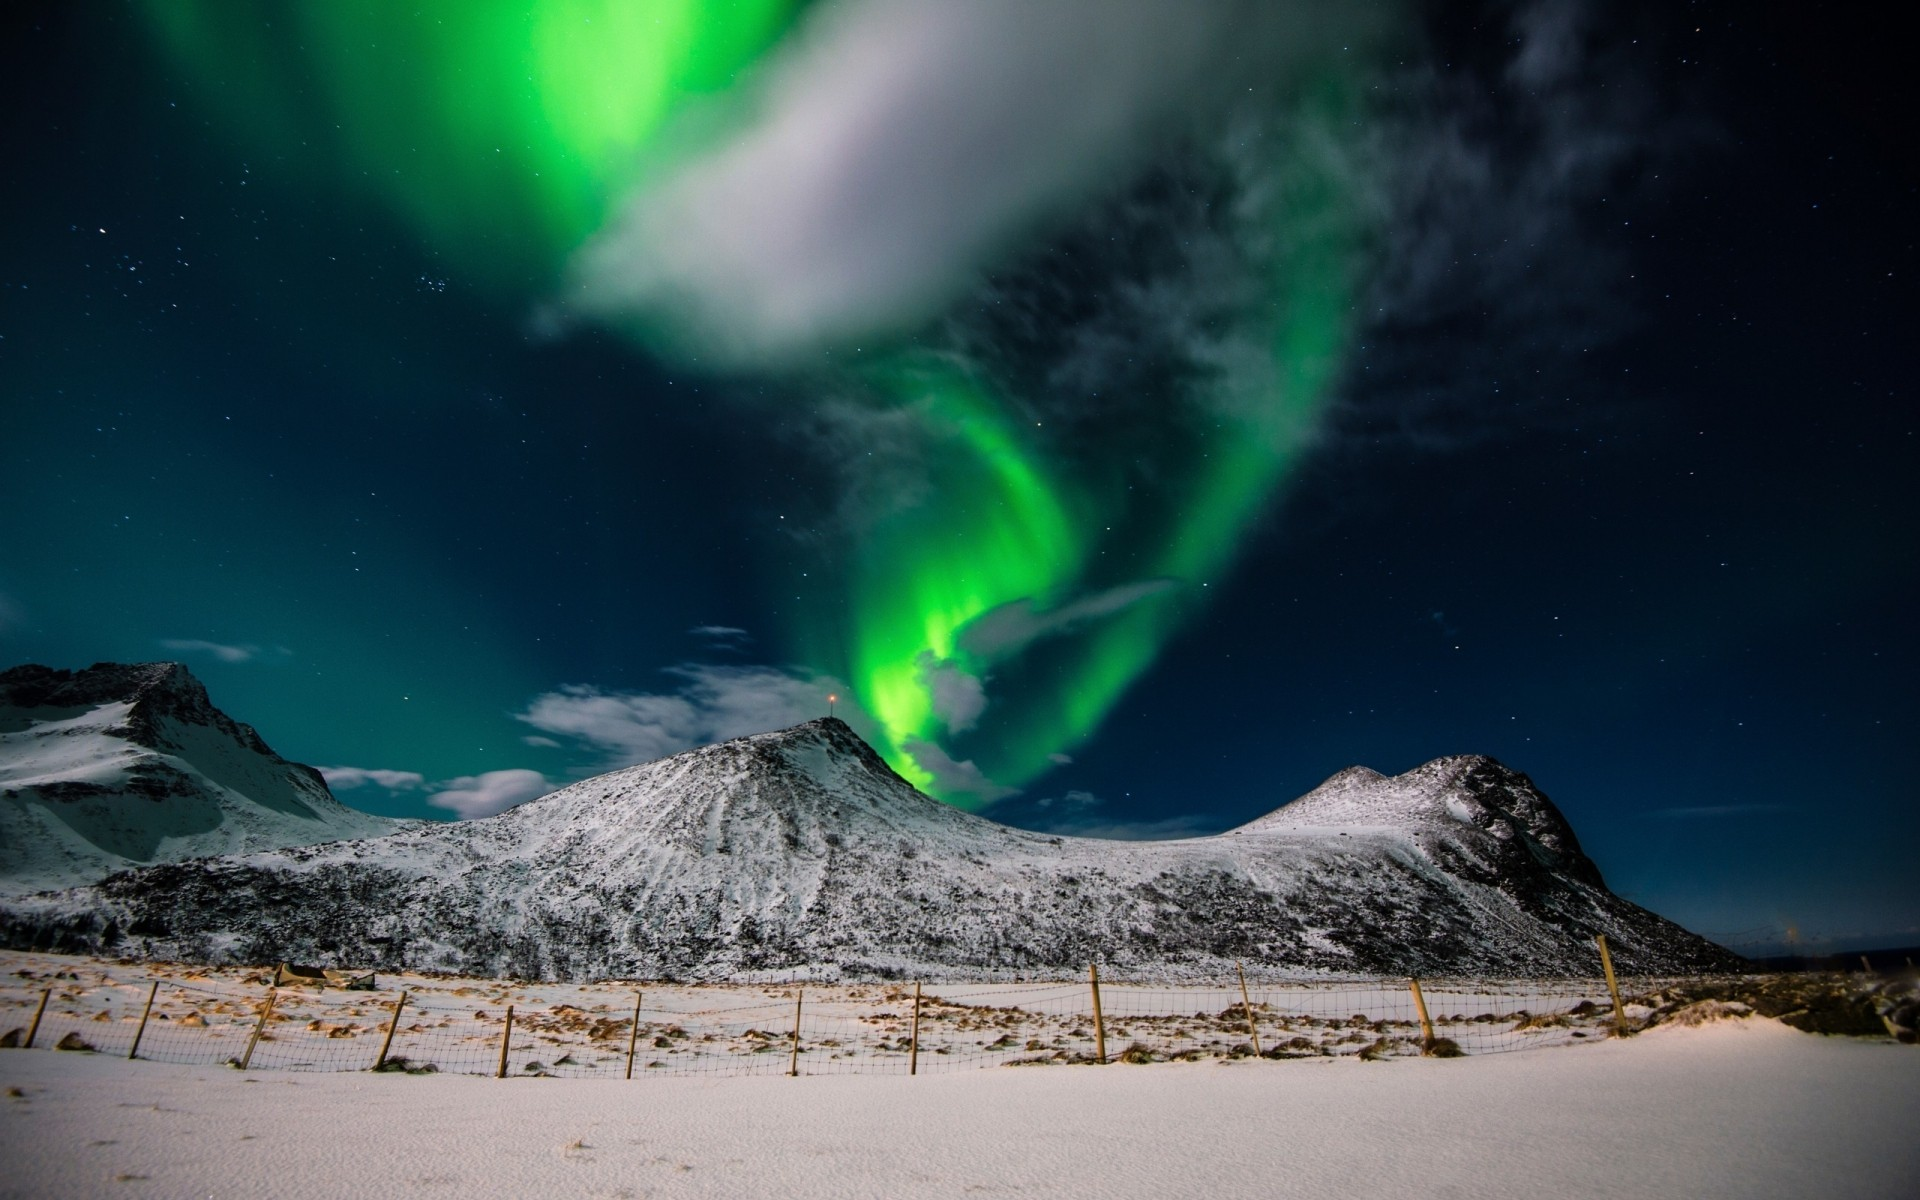 Aurora Borealis Northern Lights Desktop Wallpapers For Free